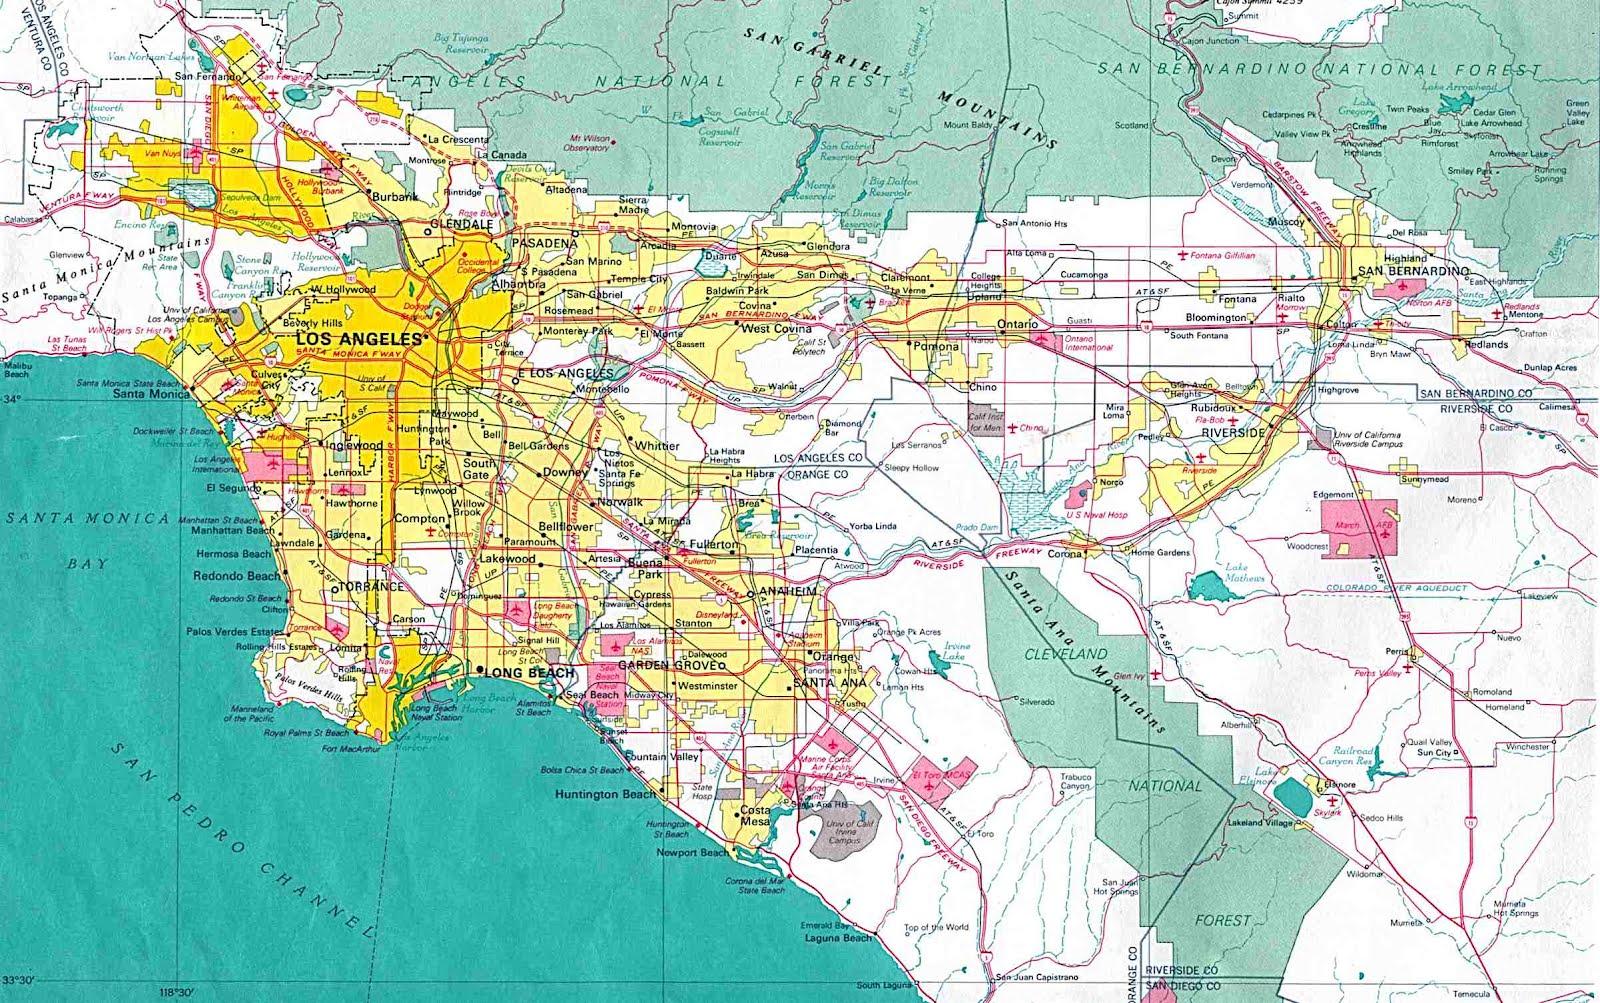 maps of dallas: Map of Los Angeles Map Greater Los Angeles on map greater tacoma, map long beach, map hollywood, map bay area, map greater nashville, map bangkok tourist attractions, map inland empire, map greater denver, greater toronto area, map san francisco, map new york, map greater boston, map anaheim, map santa monica, atlanta metropolitan area, map beverly hills, inland empire, los angeles metropolitan area, dallas/fort worth metroplex, map santa barbara, seoul national capital area, map san gabriel valley, baltimore–washington metropolitan area, new york metropolitan area, greater houston, map salt lake city, map south orange county, map minneapolis, greater tokyo area, map silicon valley, los angeles county, san diego metropolitan area, orange county,